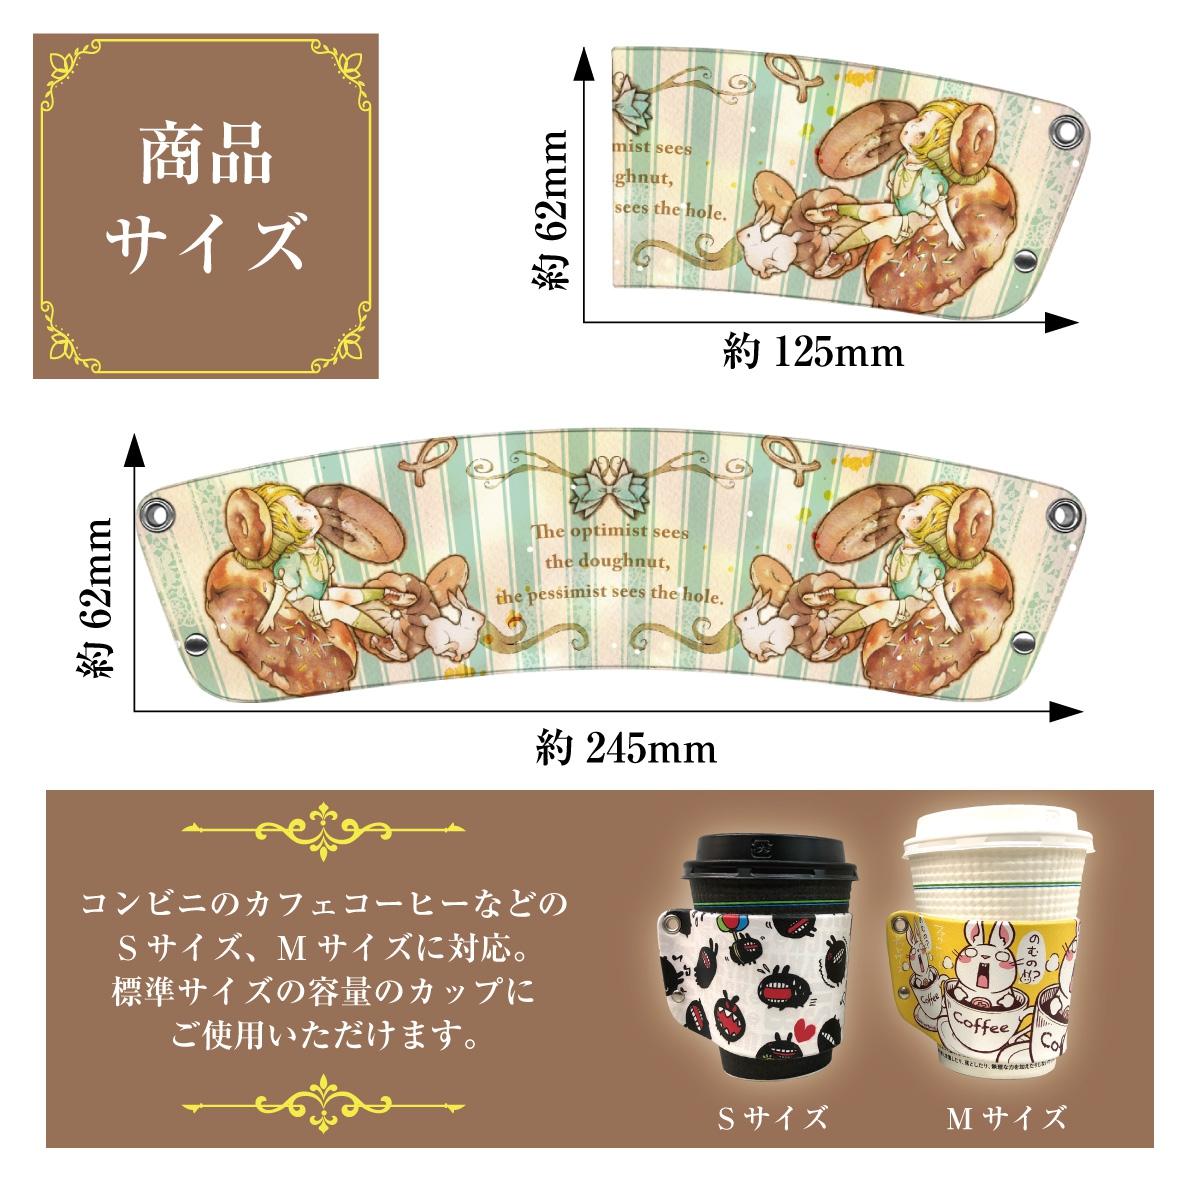 tk-jiang(ティーケージアン)オリジナル カップスリーブ レザーの商品画像7